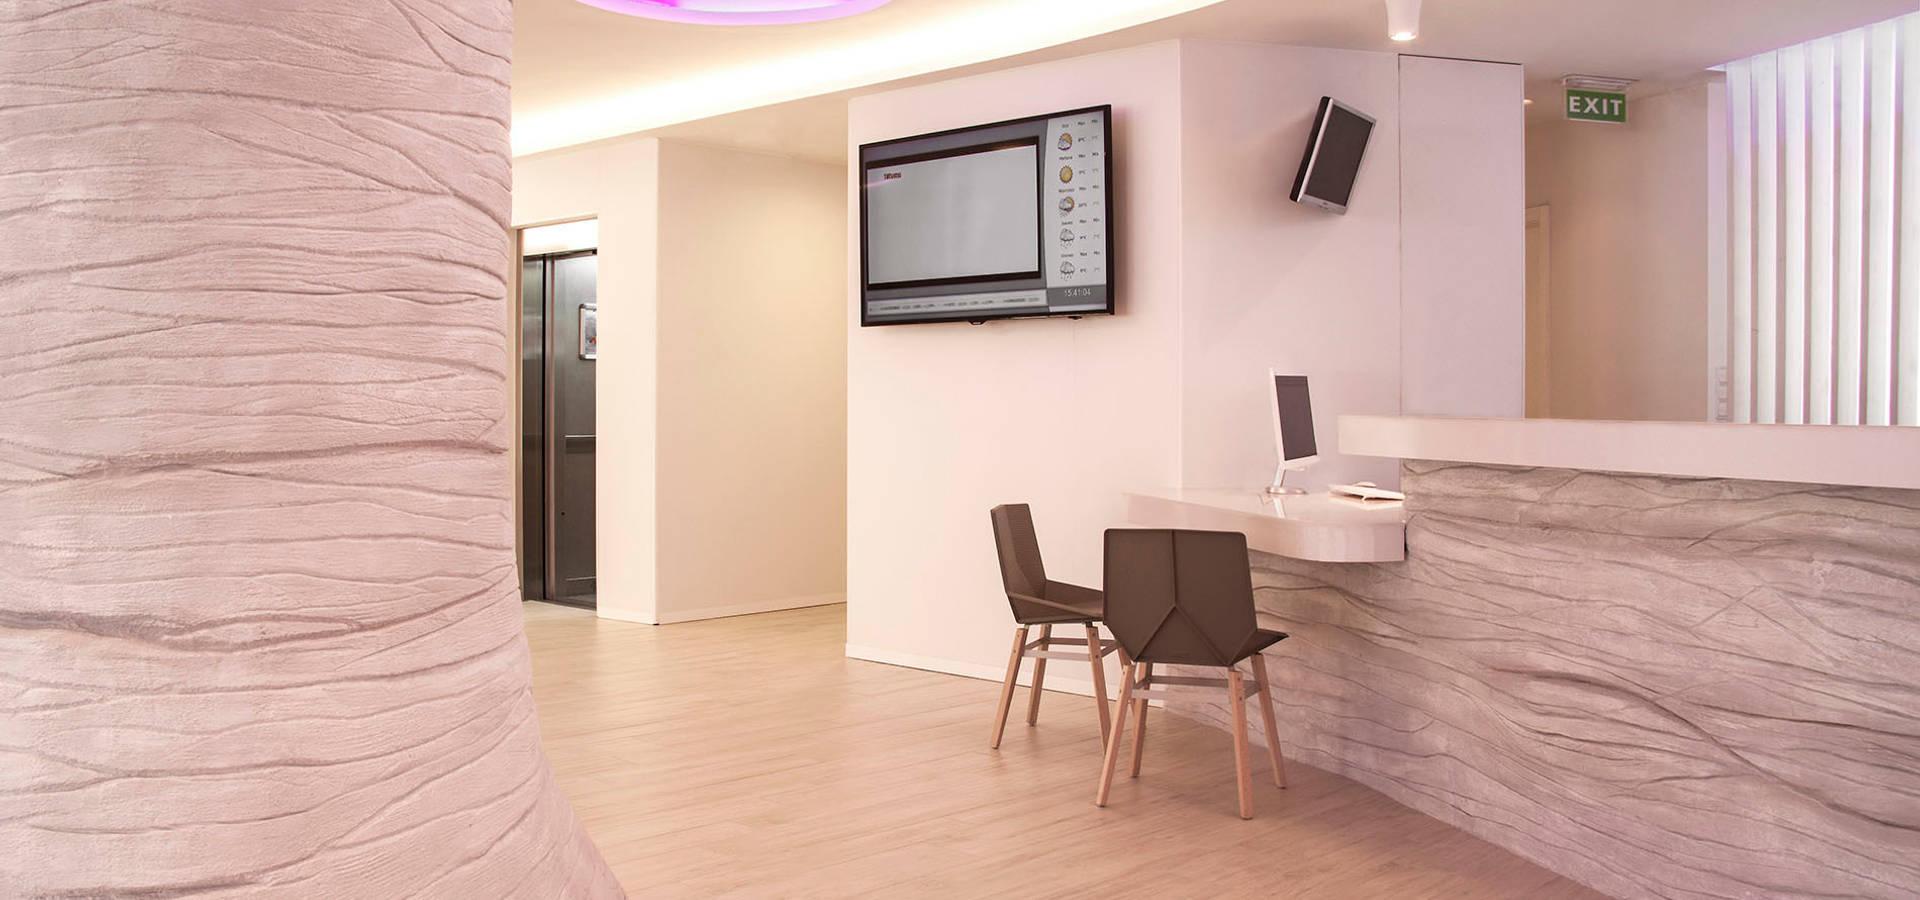 Oscar Vidal Studio